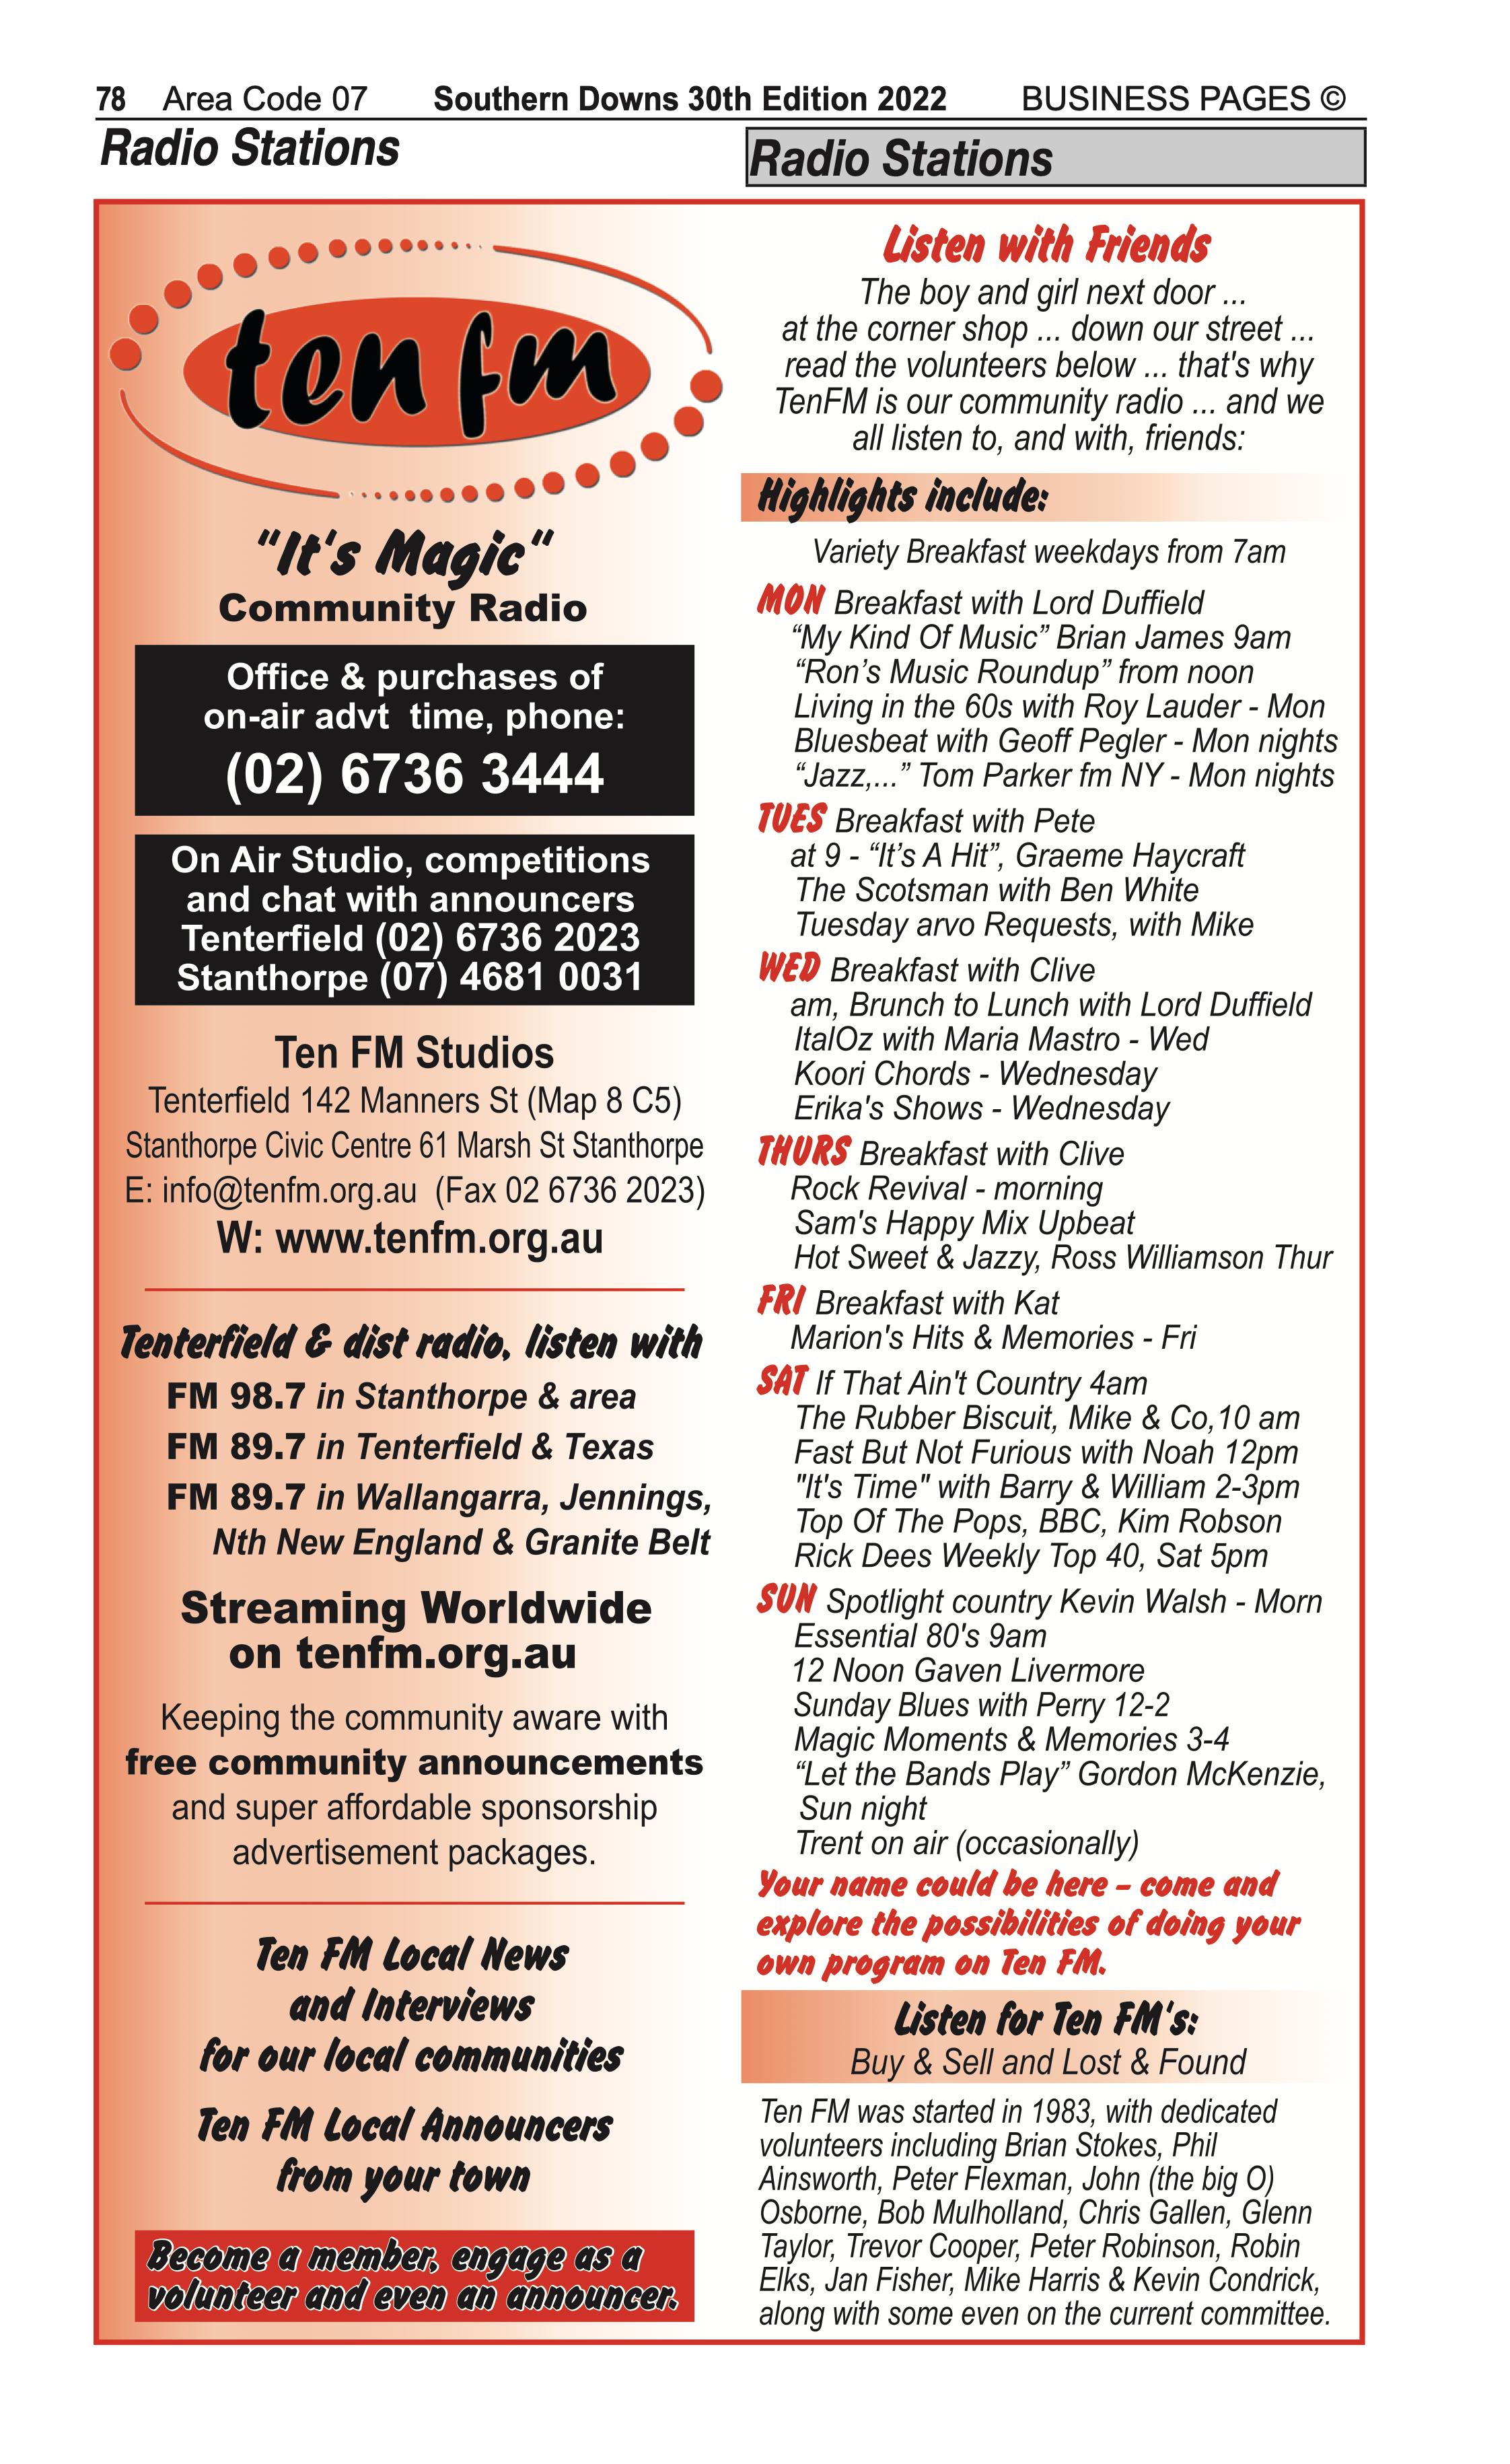 4 Water Supplies | Irrigation in Stanthorpe | PBezy Pocket Books local directories - page 78